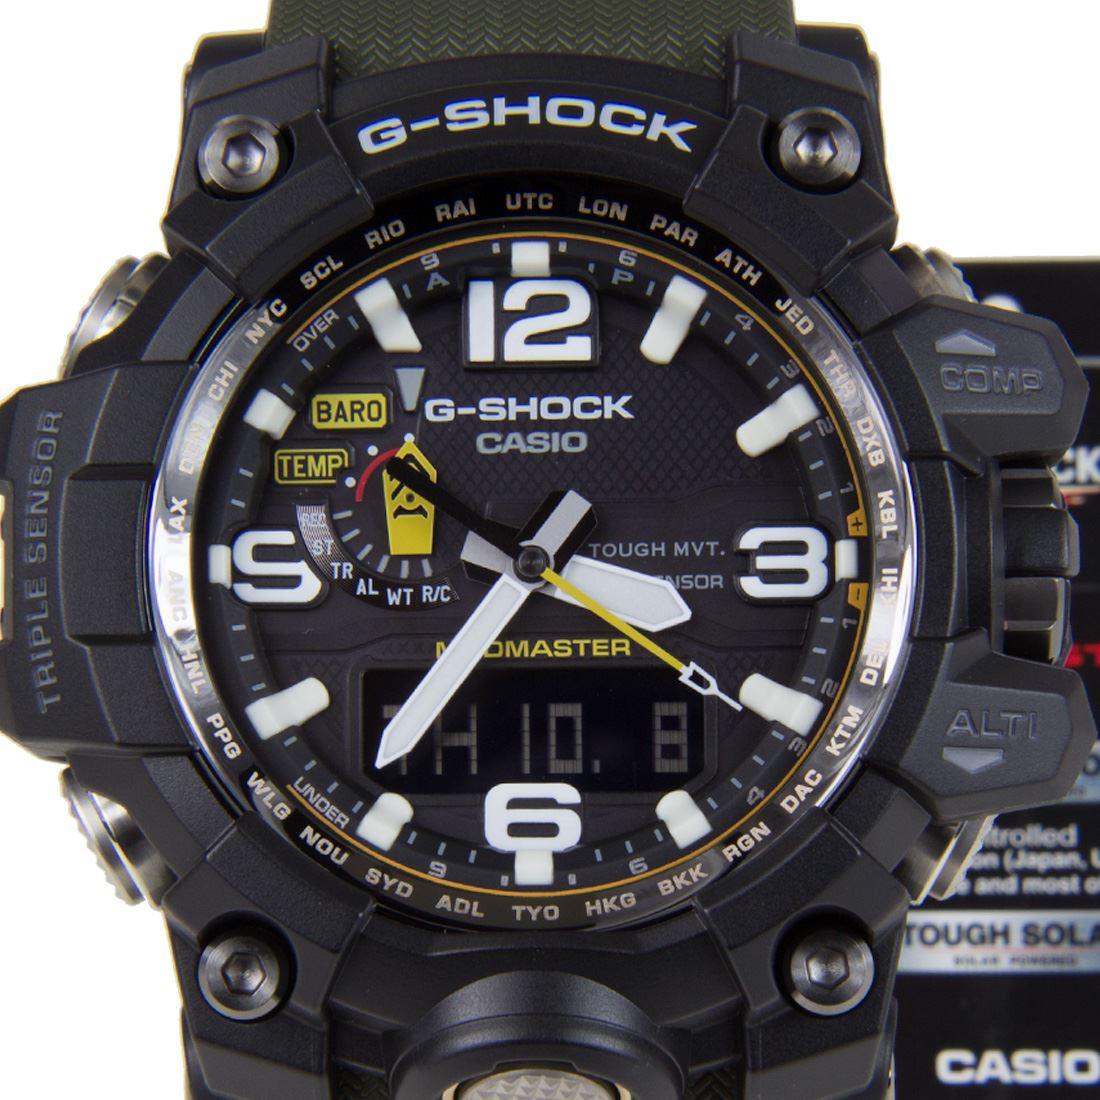 CASIO G-SHOCK MUDMASTER WATCH GWG-1000-1A3 GWG-1000-1A